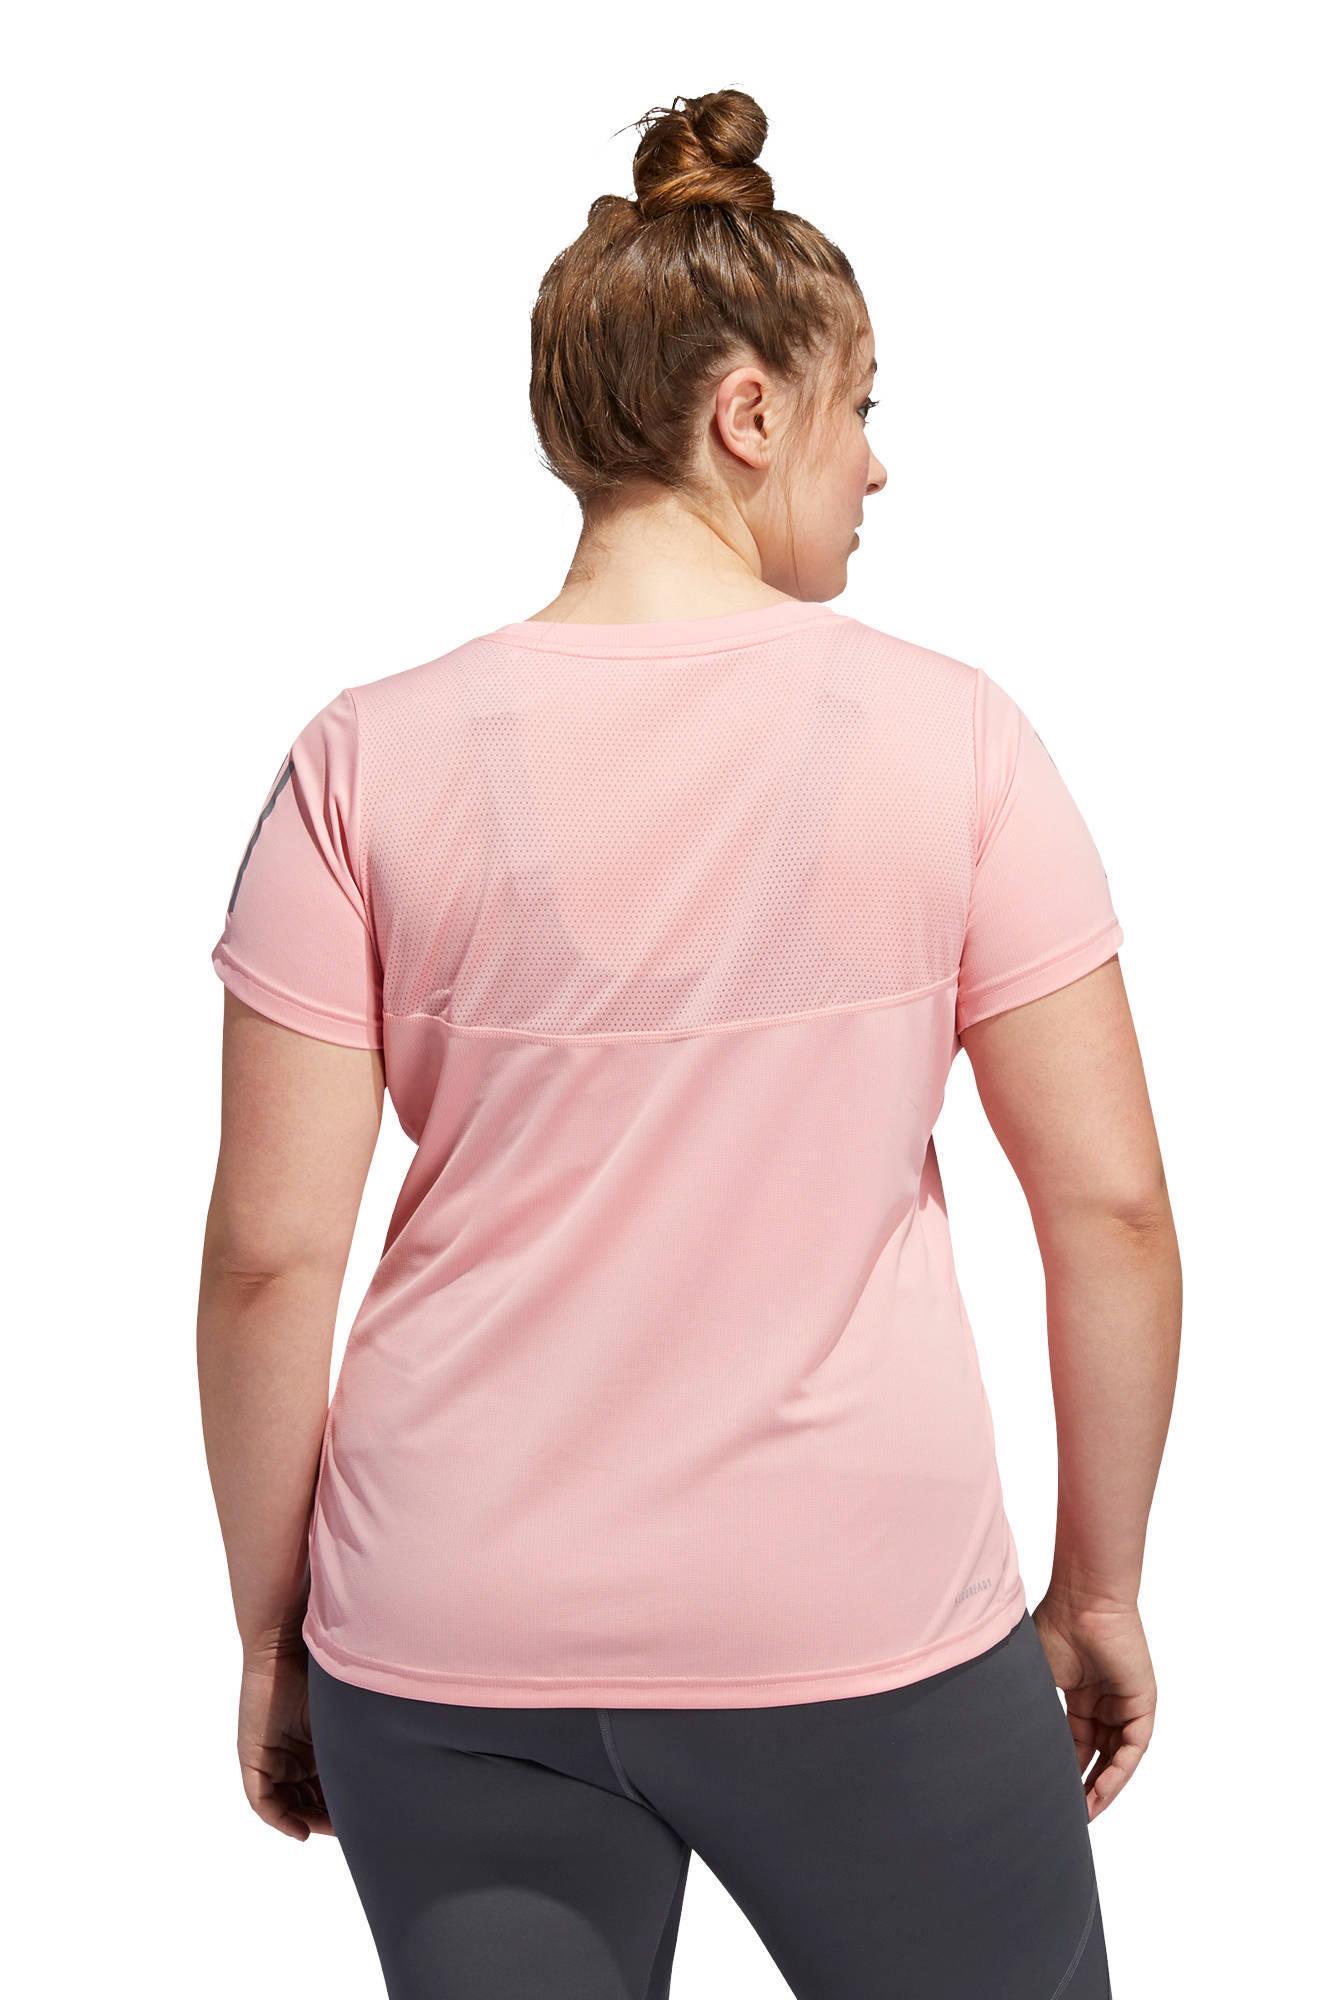 Adidas Performance Plus Size Sport T-shirt Lichtroze FcgA3nyK